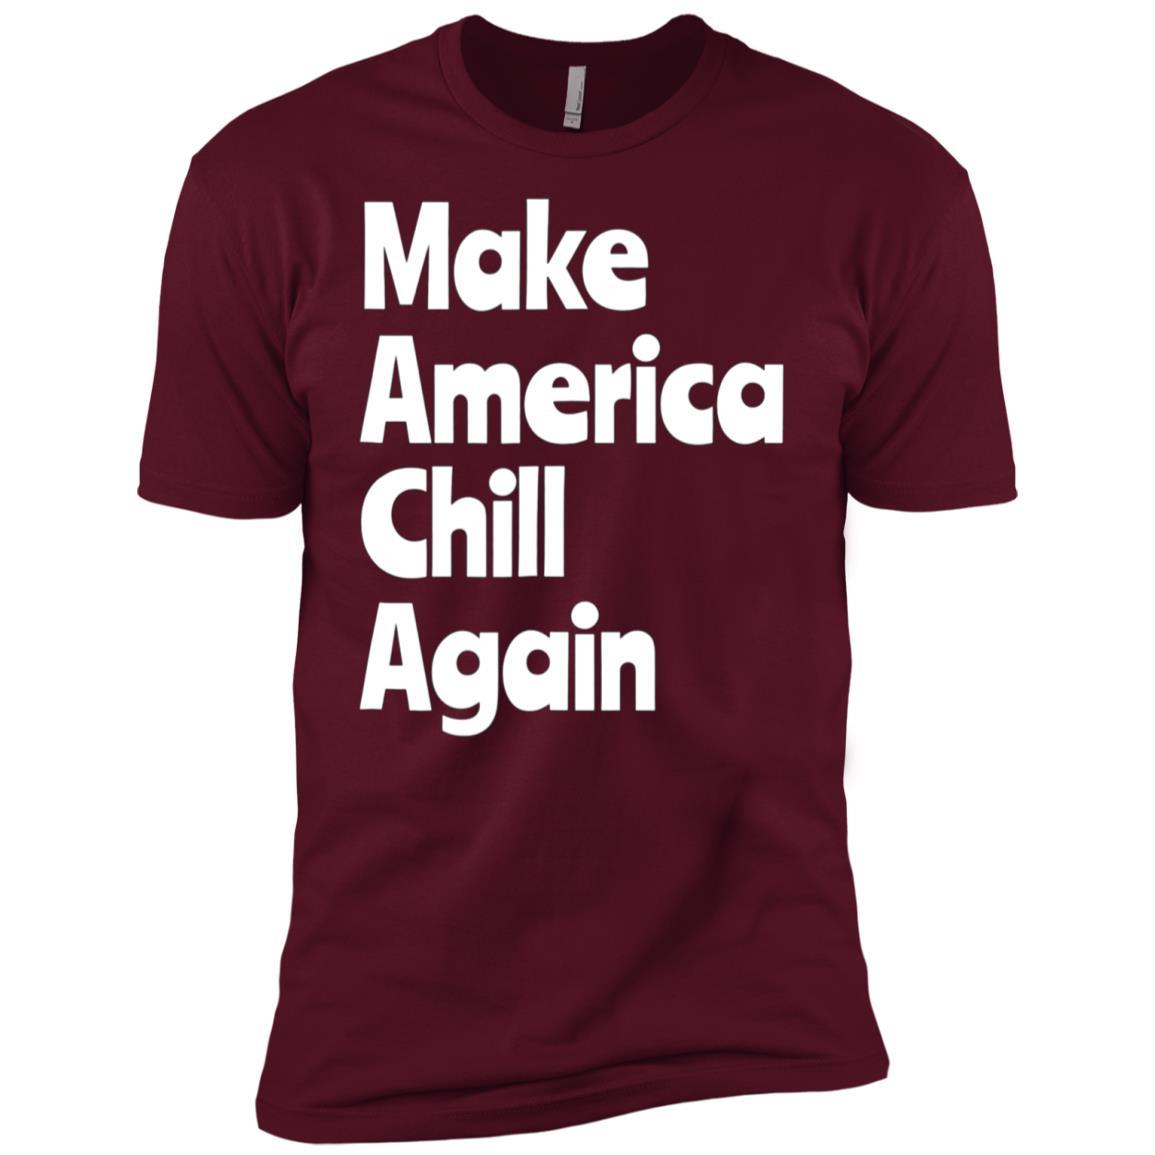 Make America Chill Again Funny Gift Yoga Meditation Men Short Sleeve T-Shirt